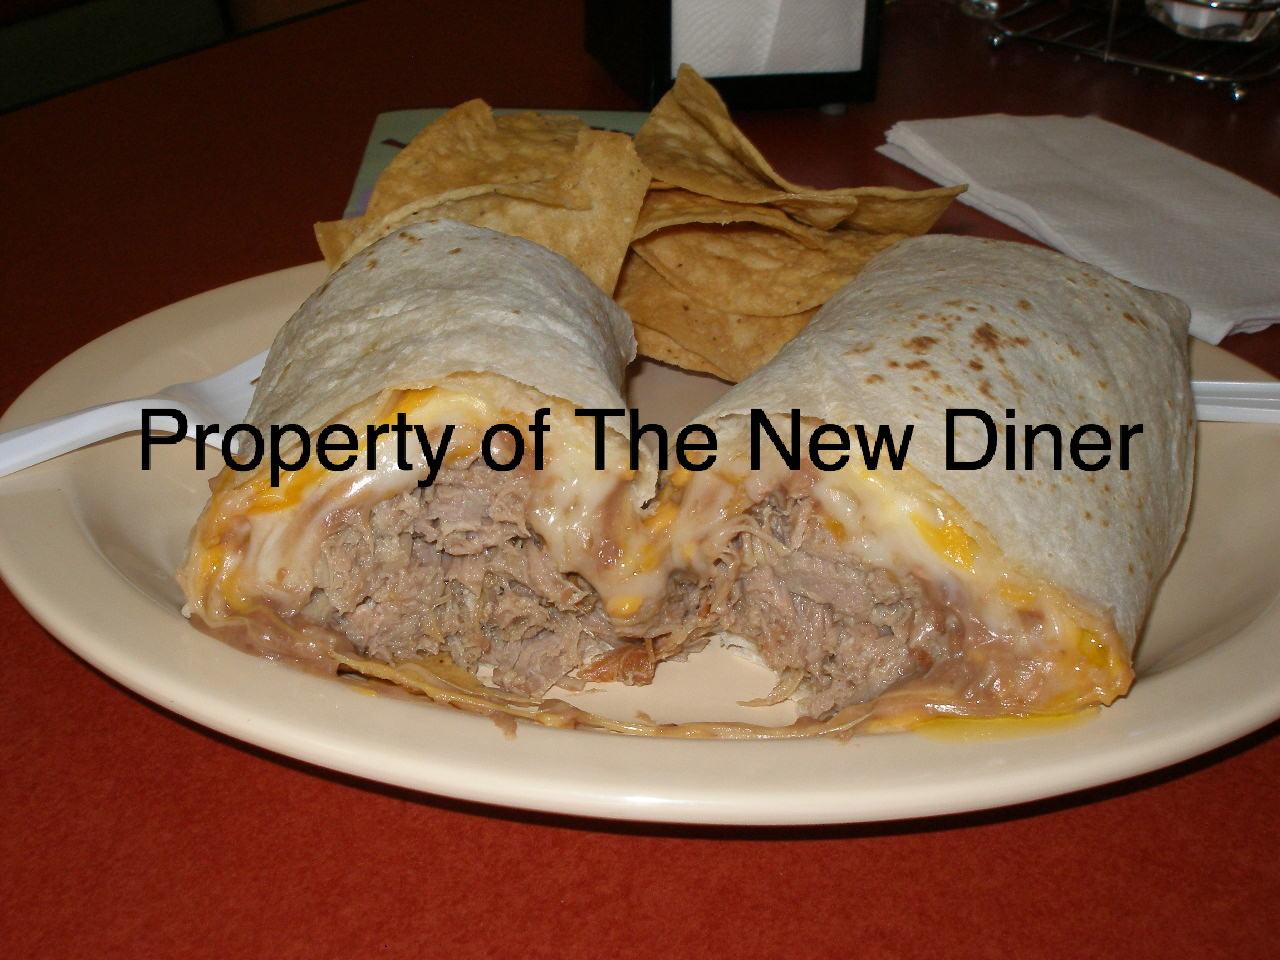 The New Diner: Los Sanchez